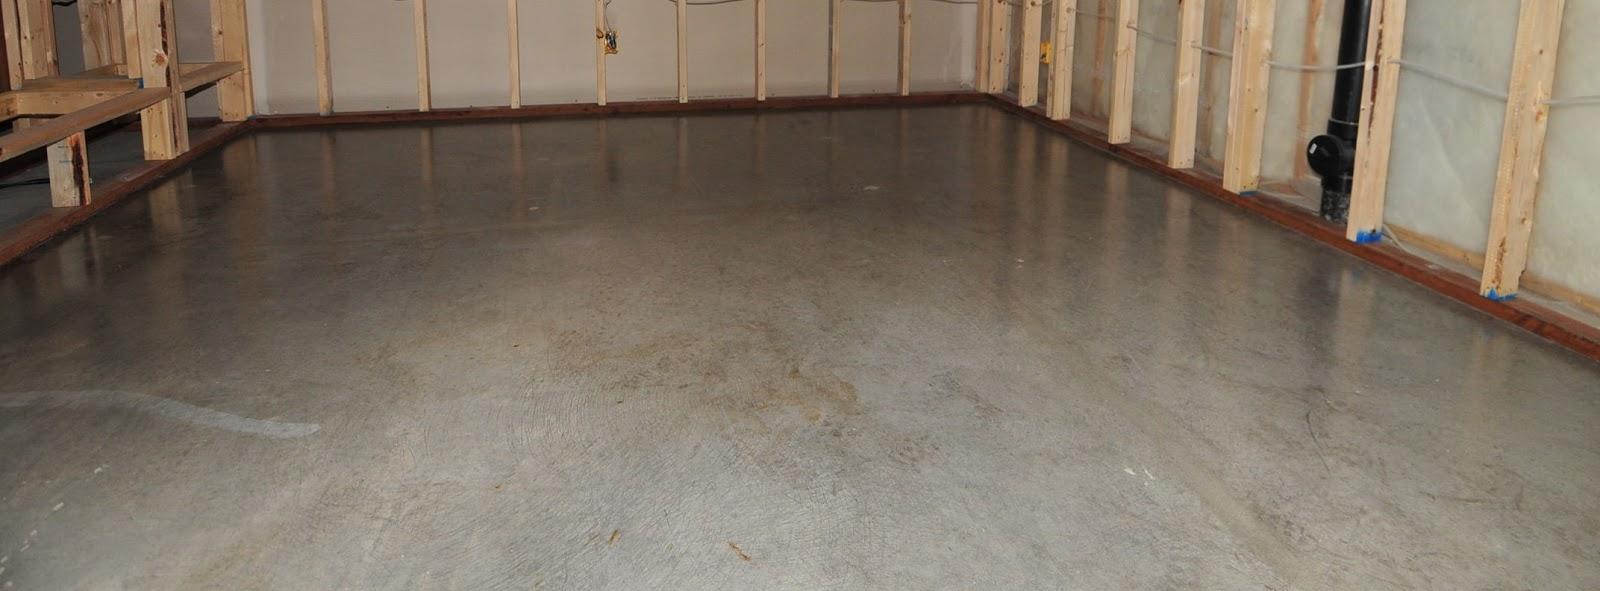 Best Product To Seal Basement Floor